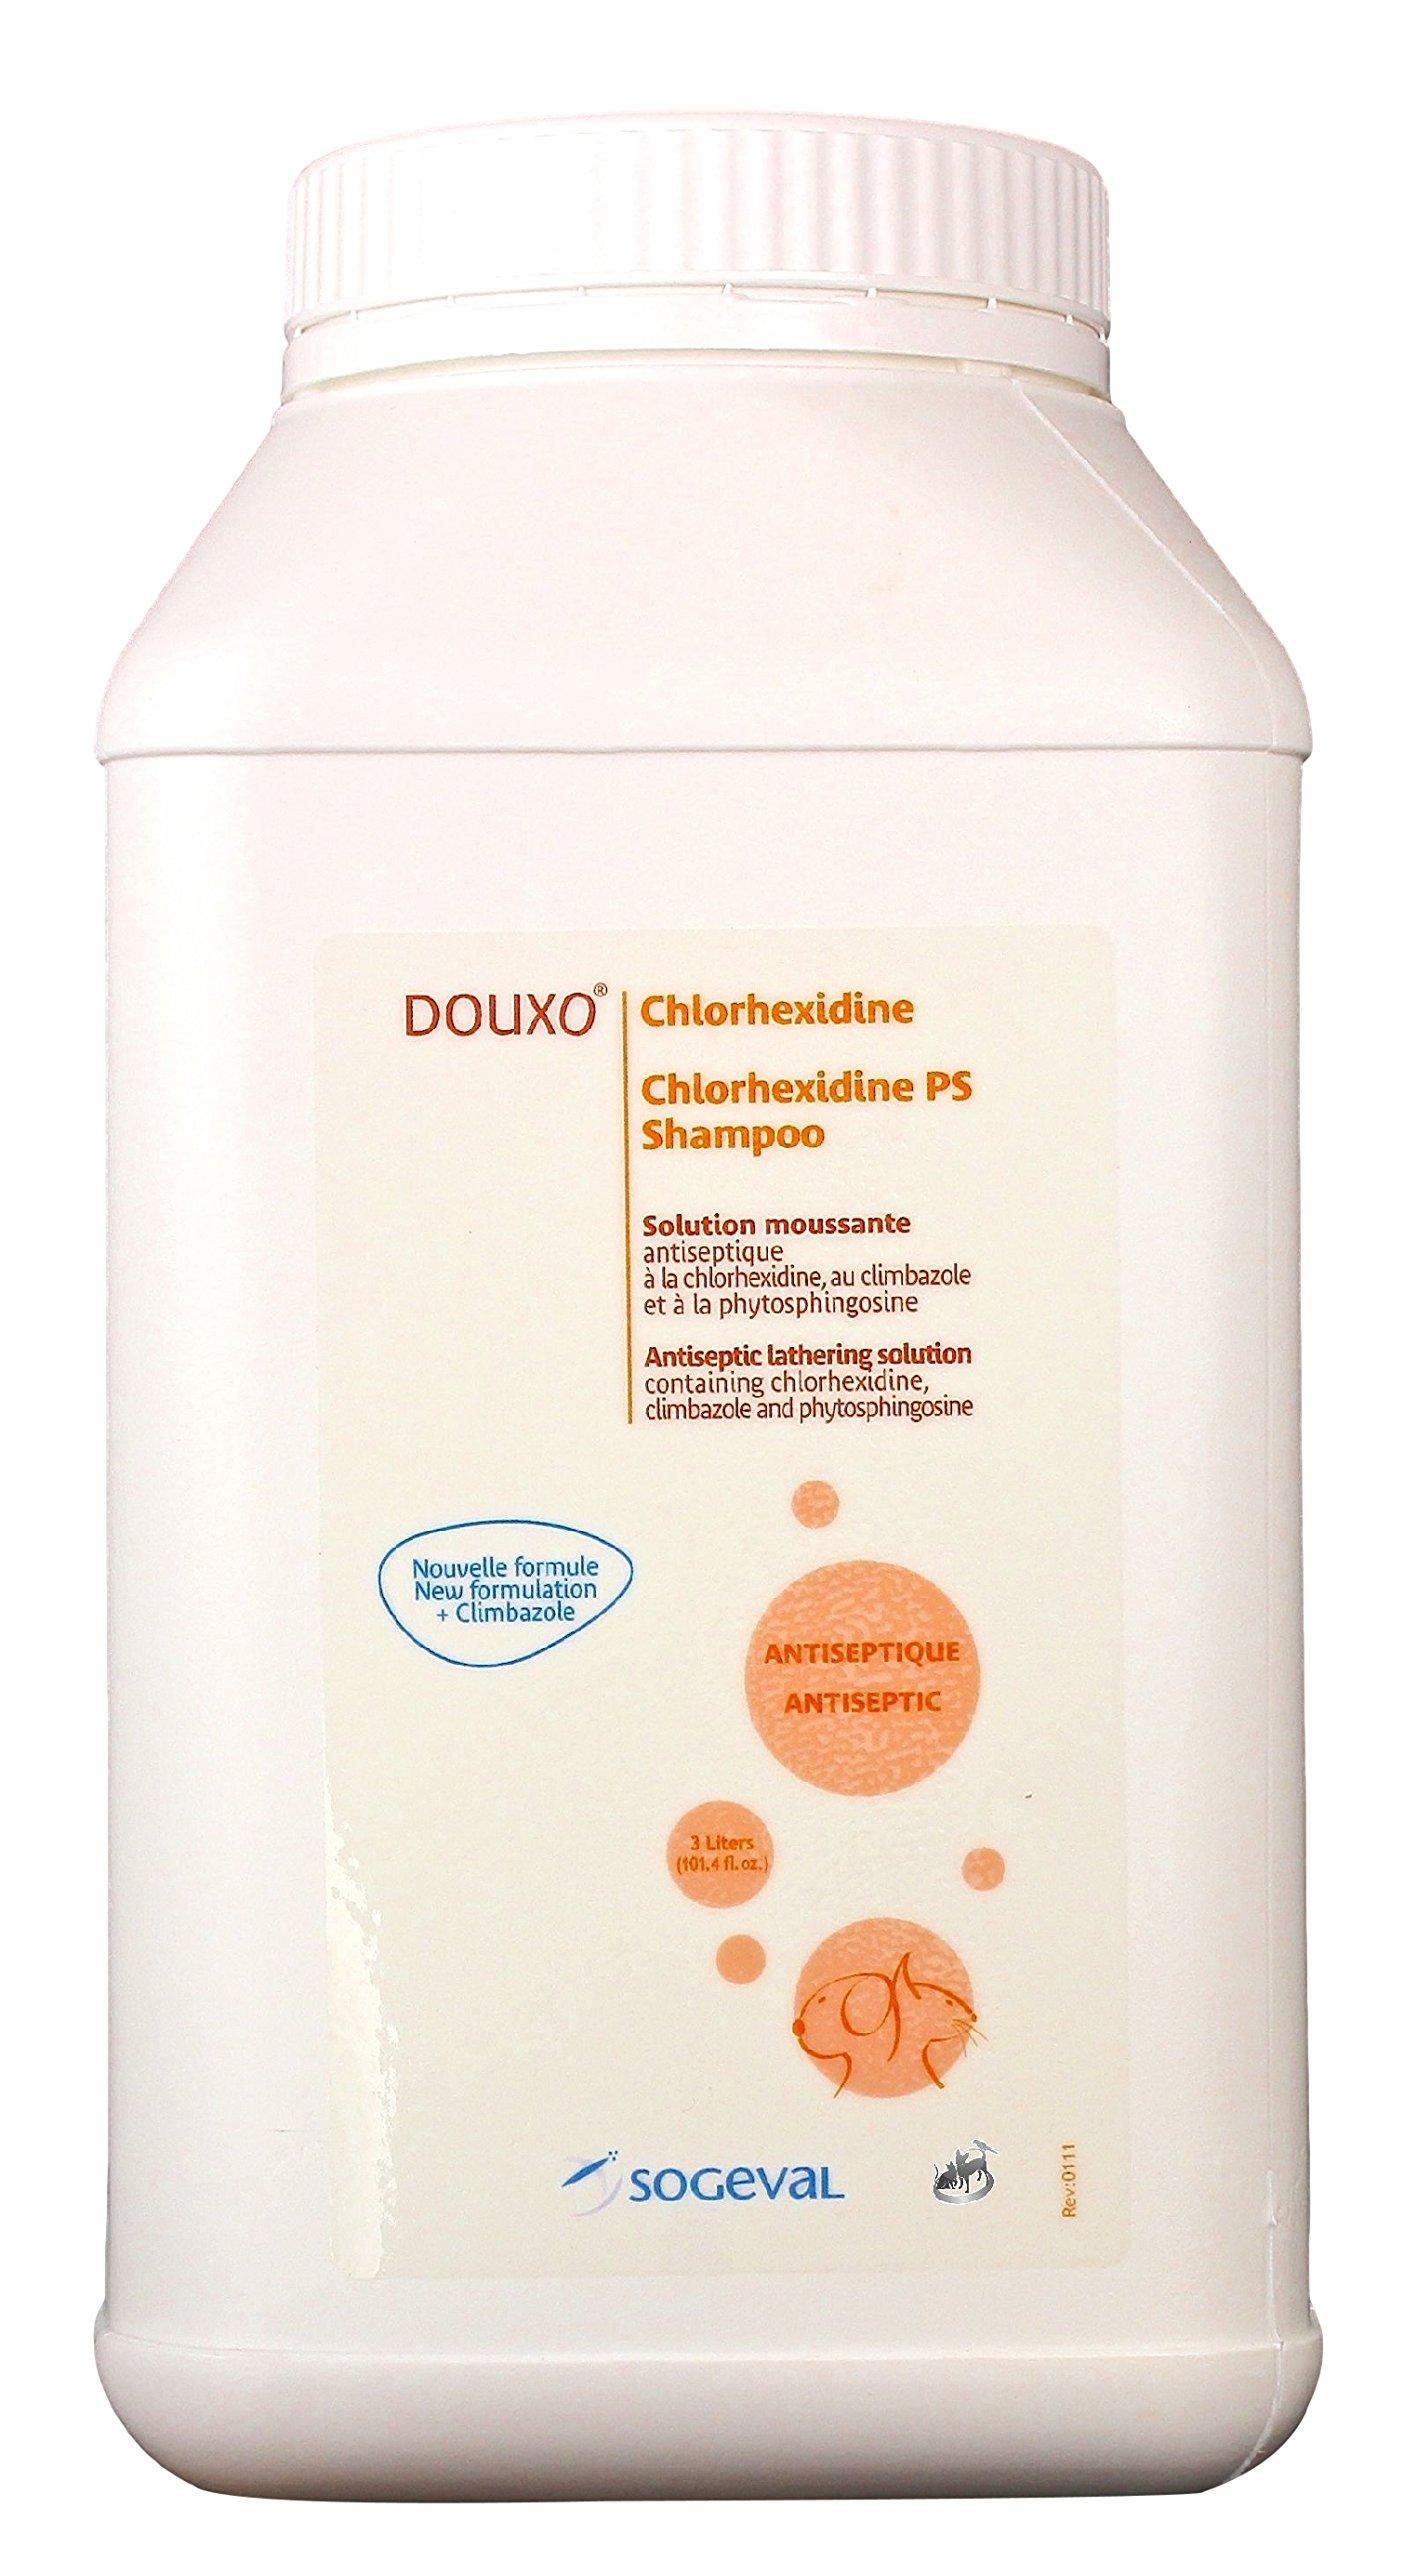 DOUXO Chlorhexidine PS Climbazole Shampoo [Orange Label] [Misc.]